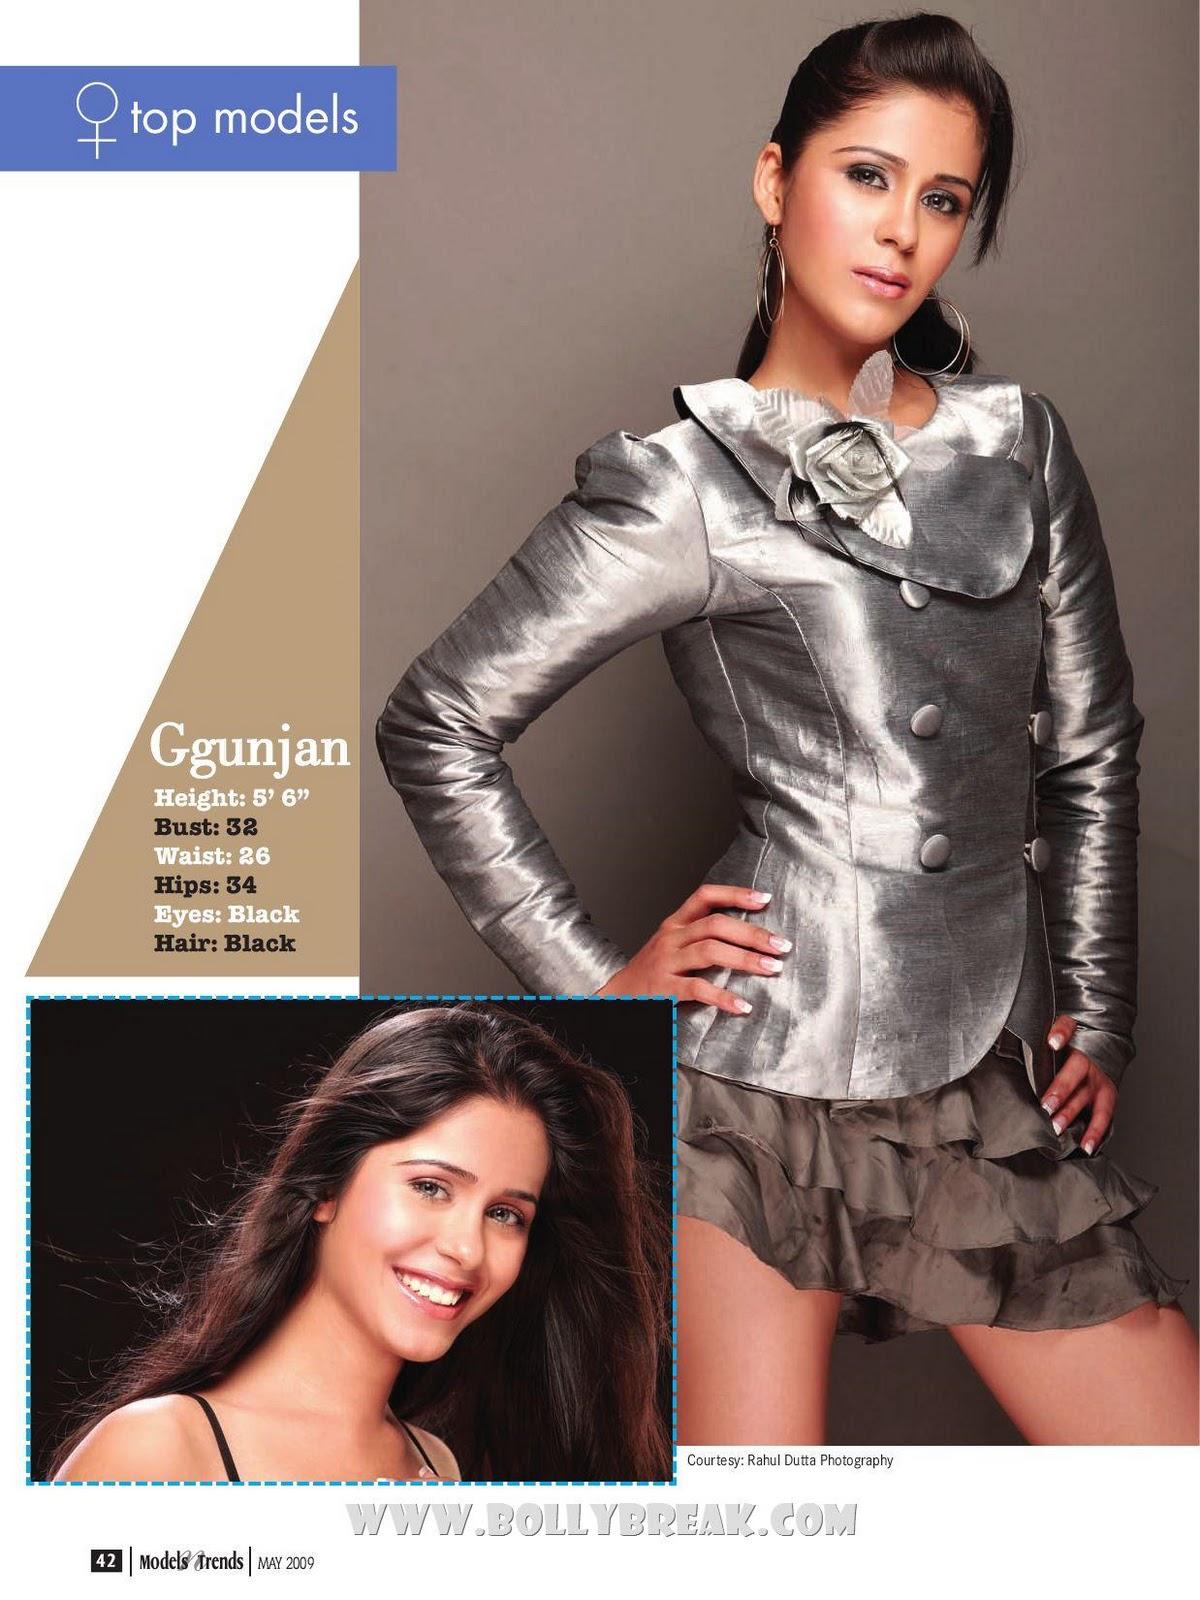 , Hot Indian Mega Models - Tia Singh, Ggunjun, Neetika